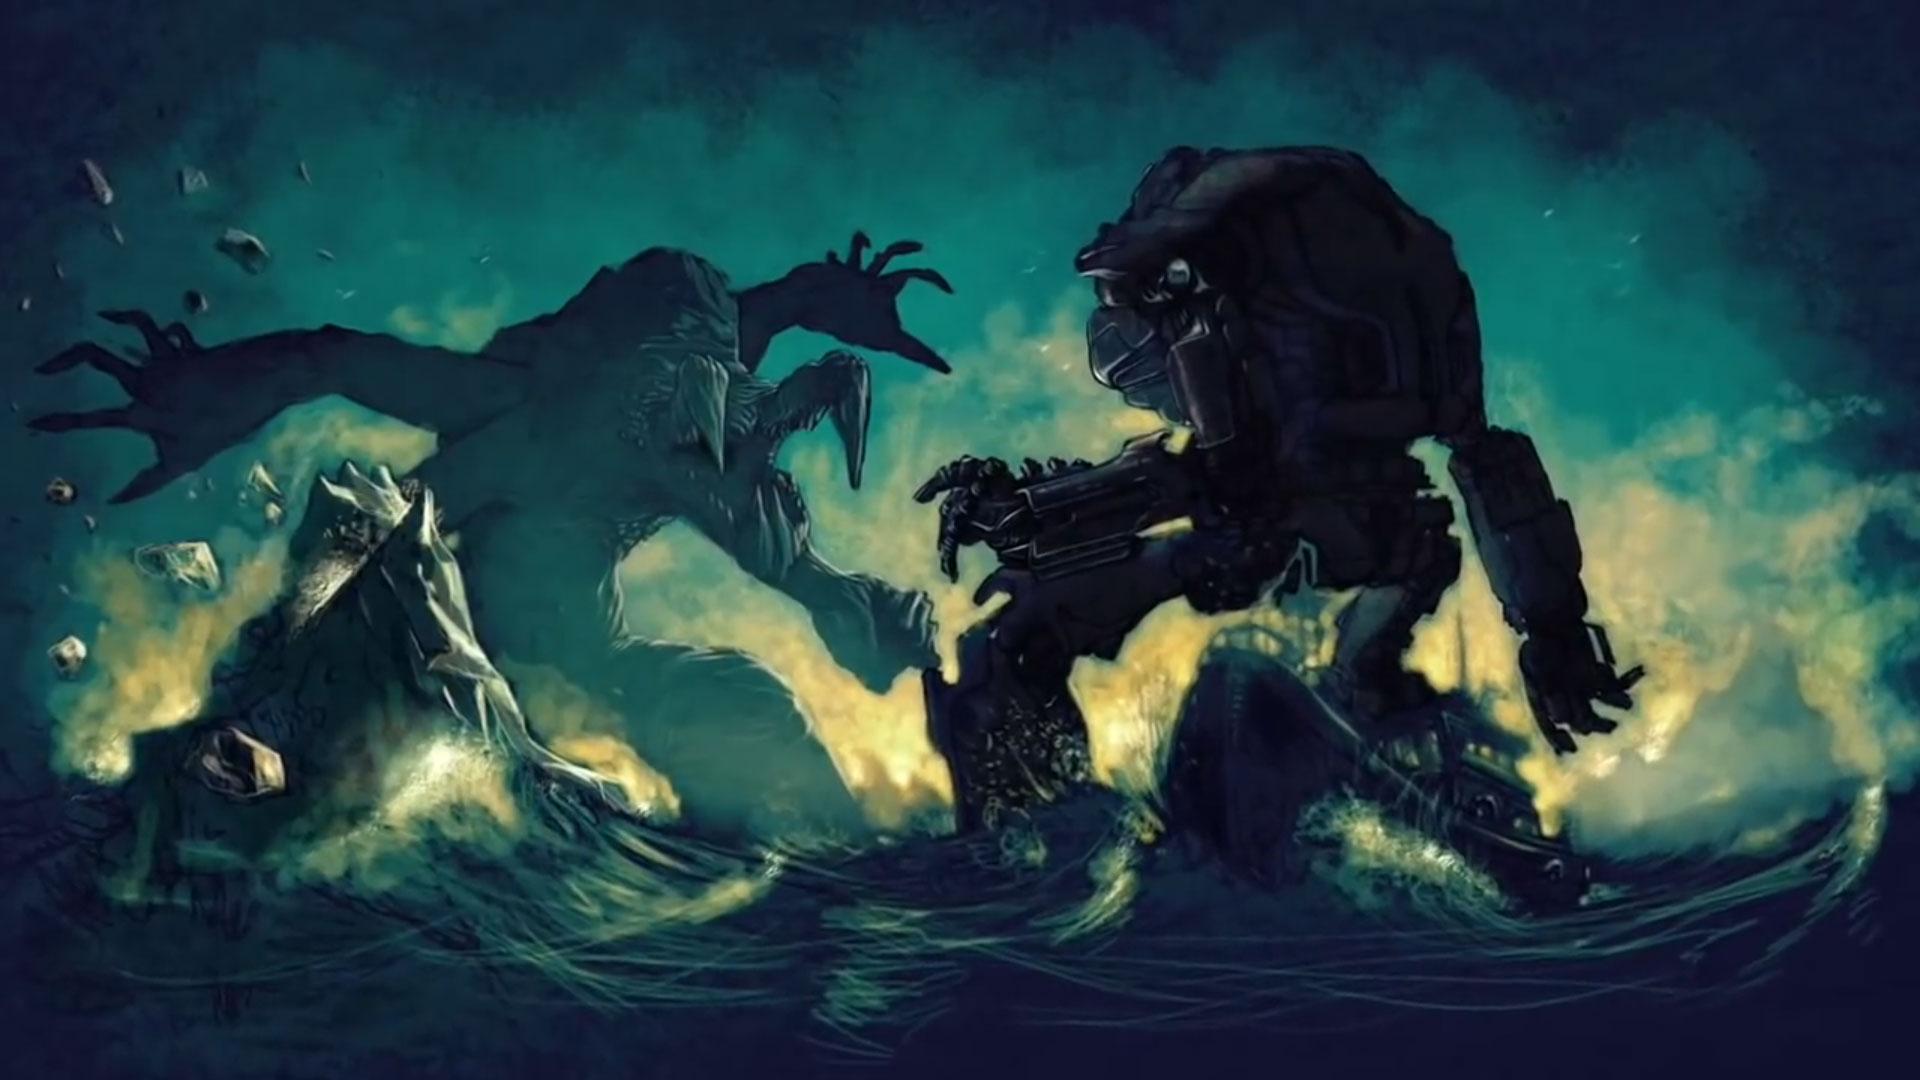 Kaiju vs jaeger